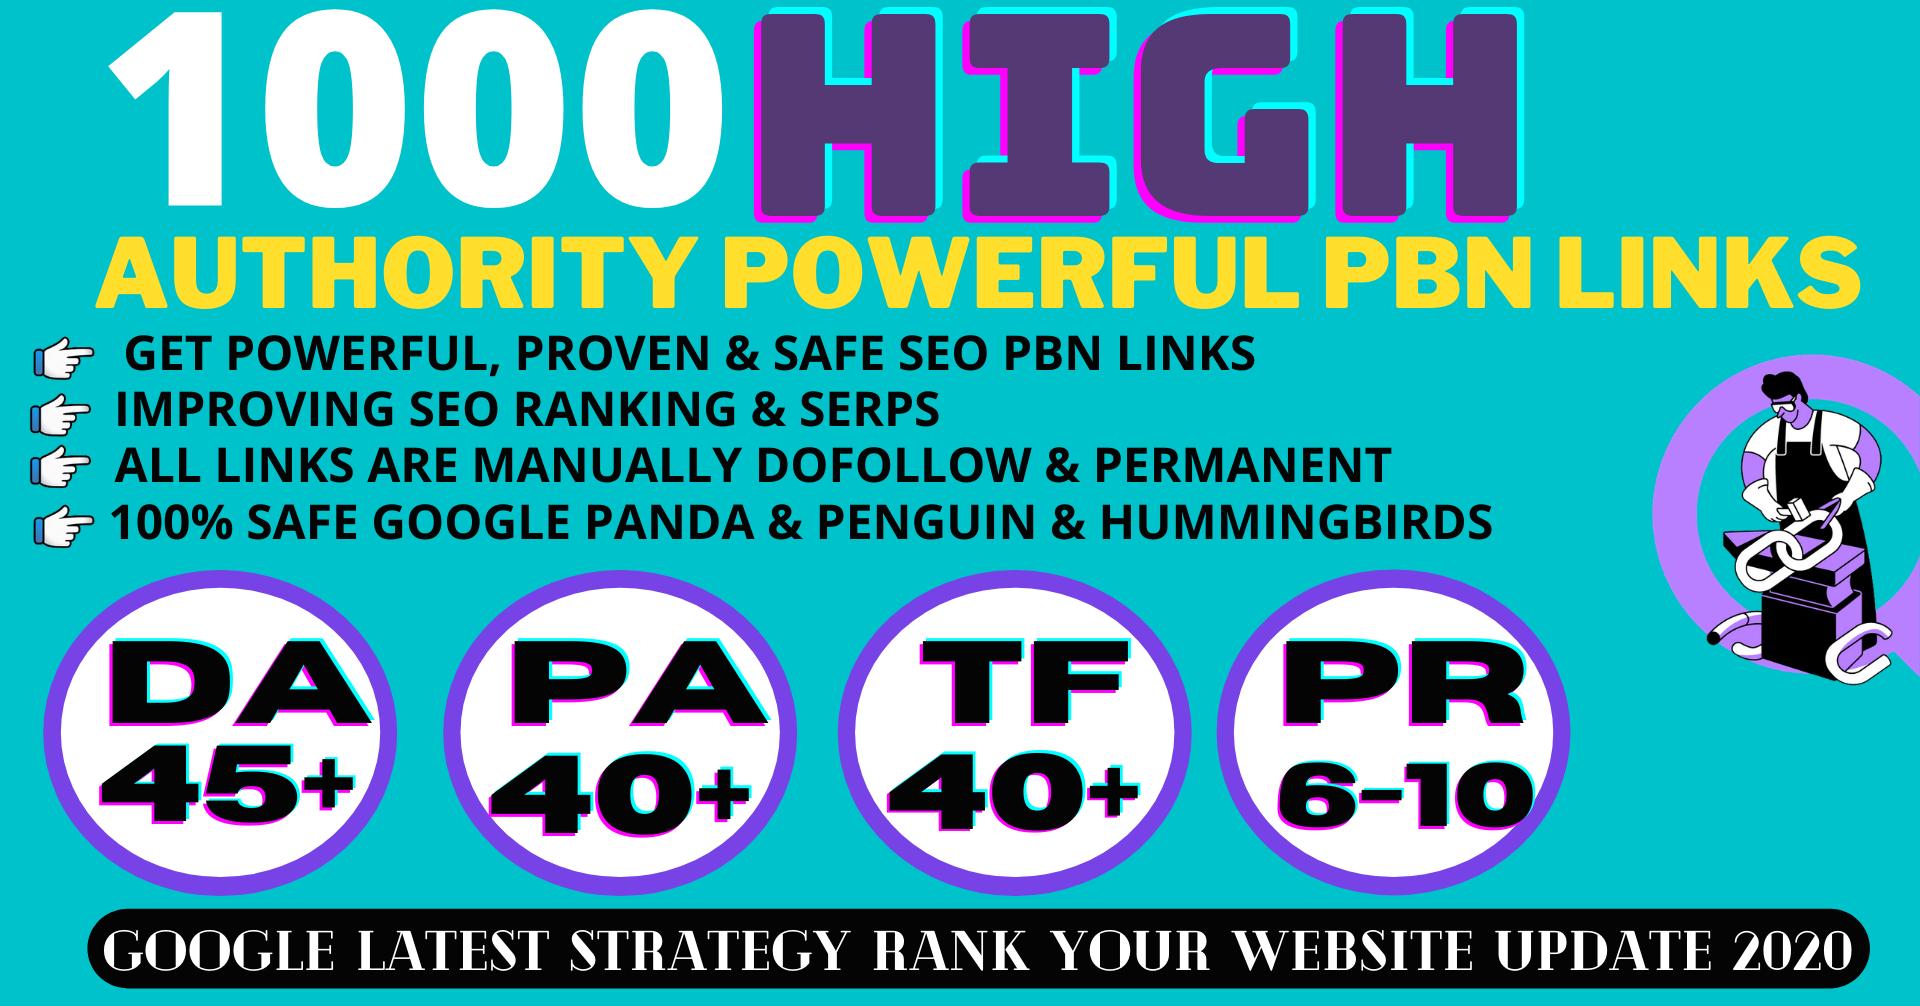 build 1000+ Permanent PBN Backlinks Web2.0 With High DA45+PA40+PR6+ Links Homepage Unique website